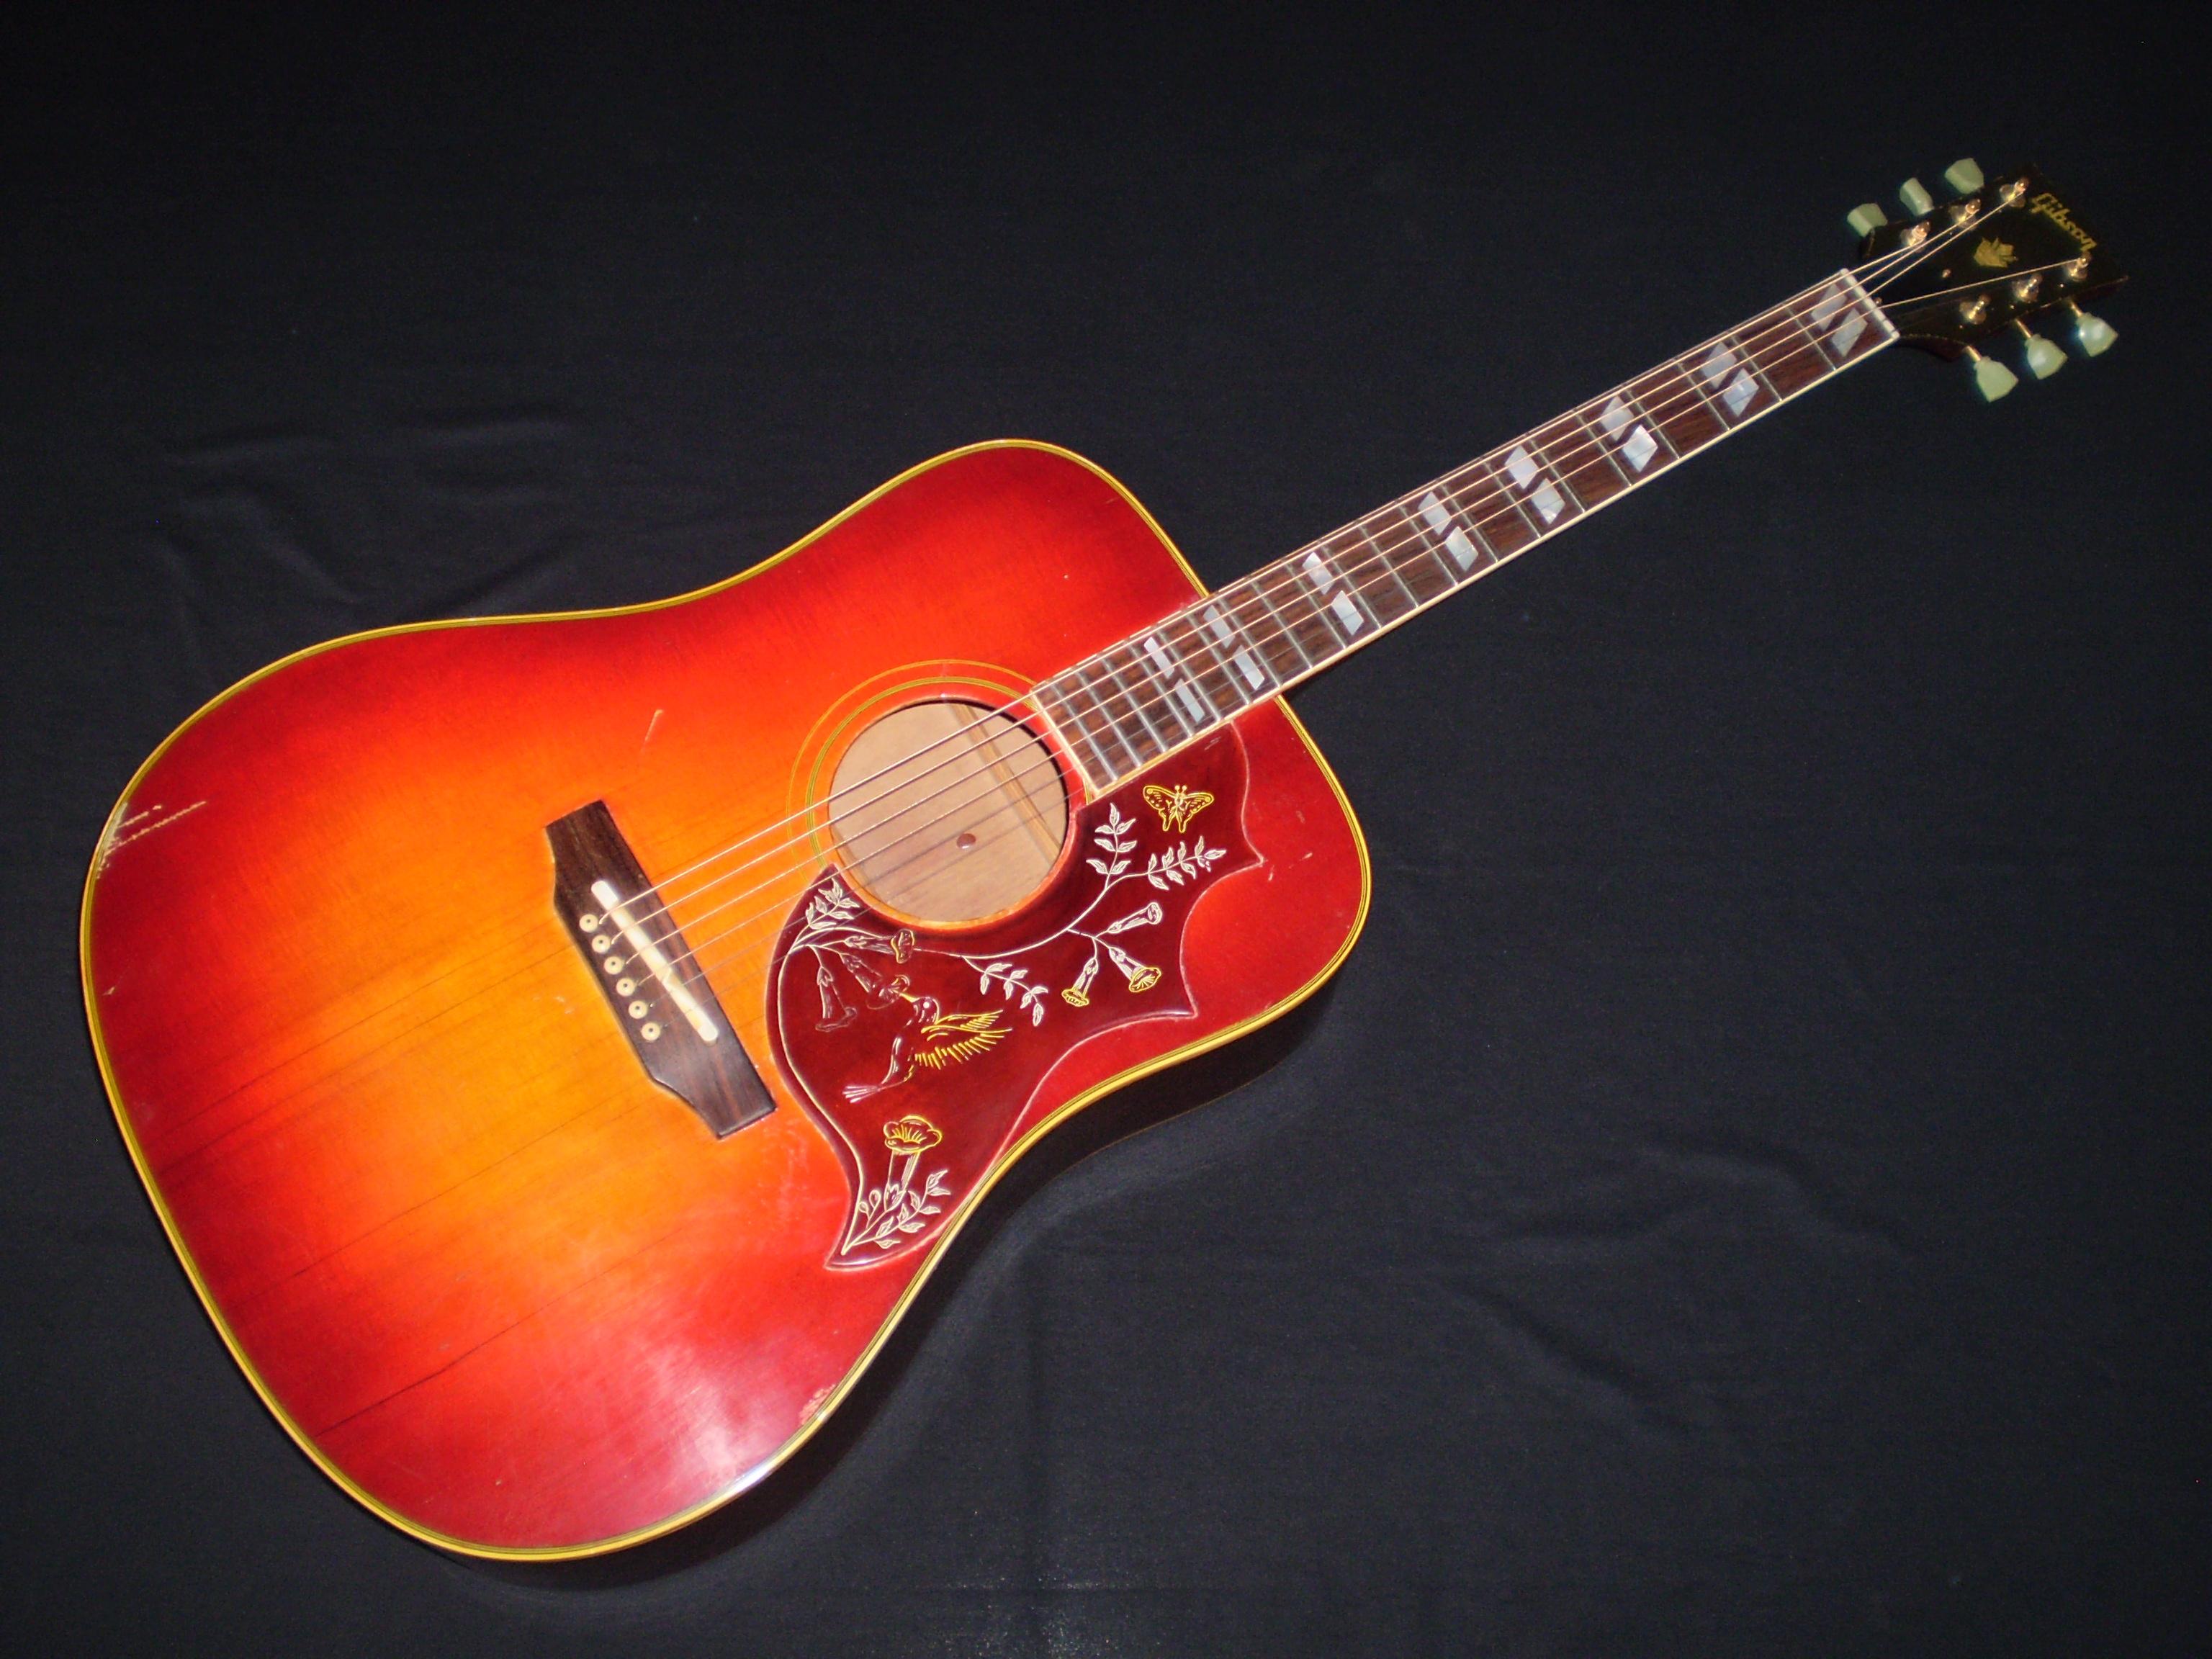 gibson hummingbird 1968 sunburst guitar for sale glenns guitars. Black Bedroom Furniture Sets. Home Design Ideas